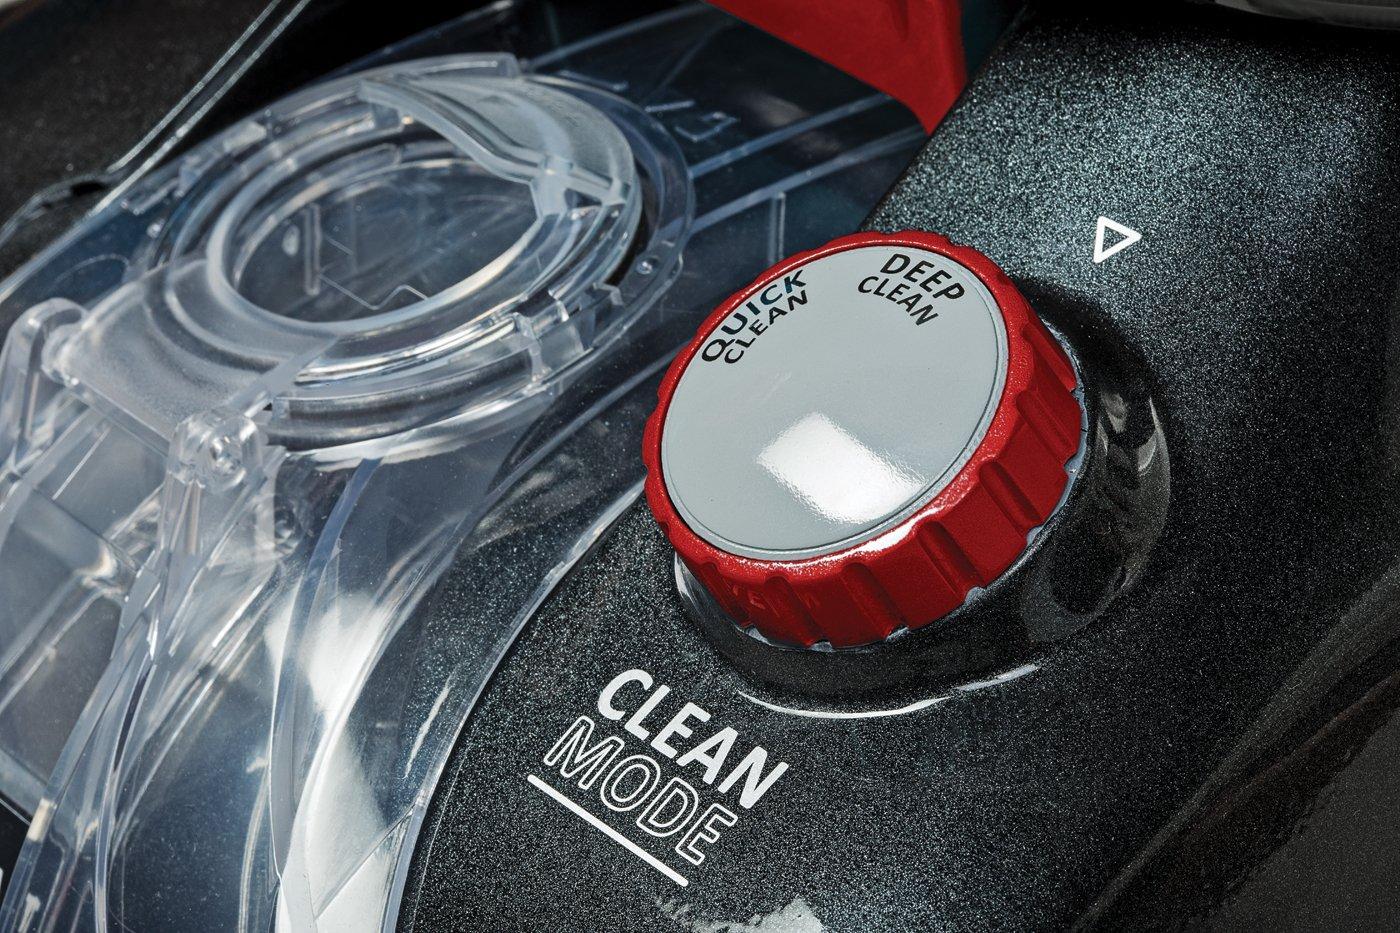 Power Scrub Elite Pet Carpet Cleaner3